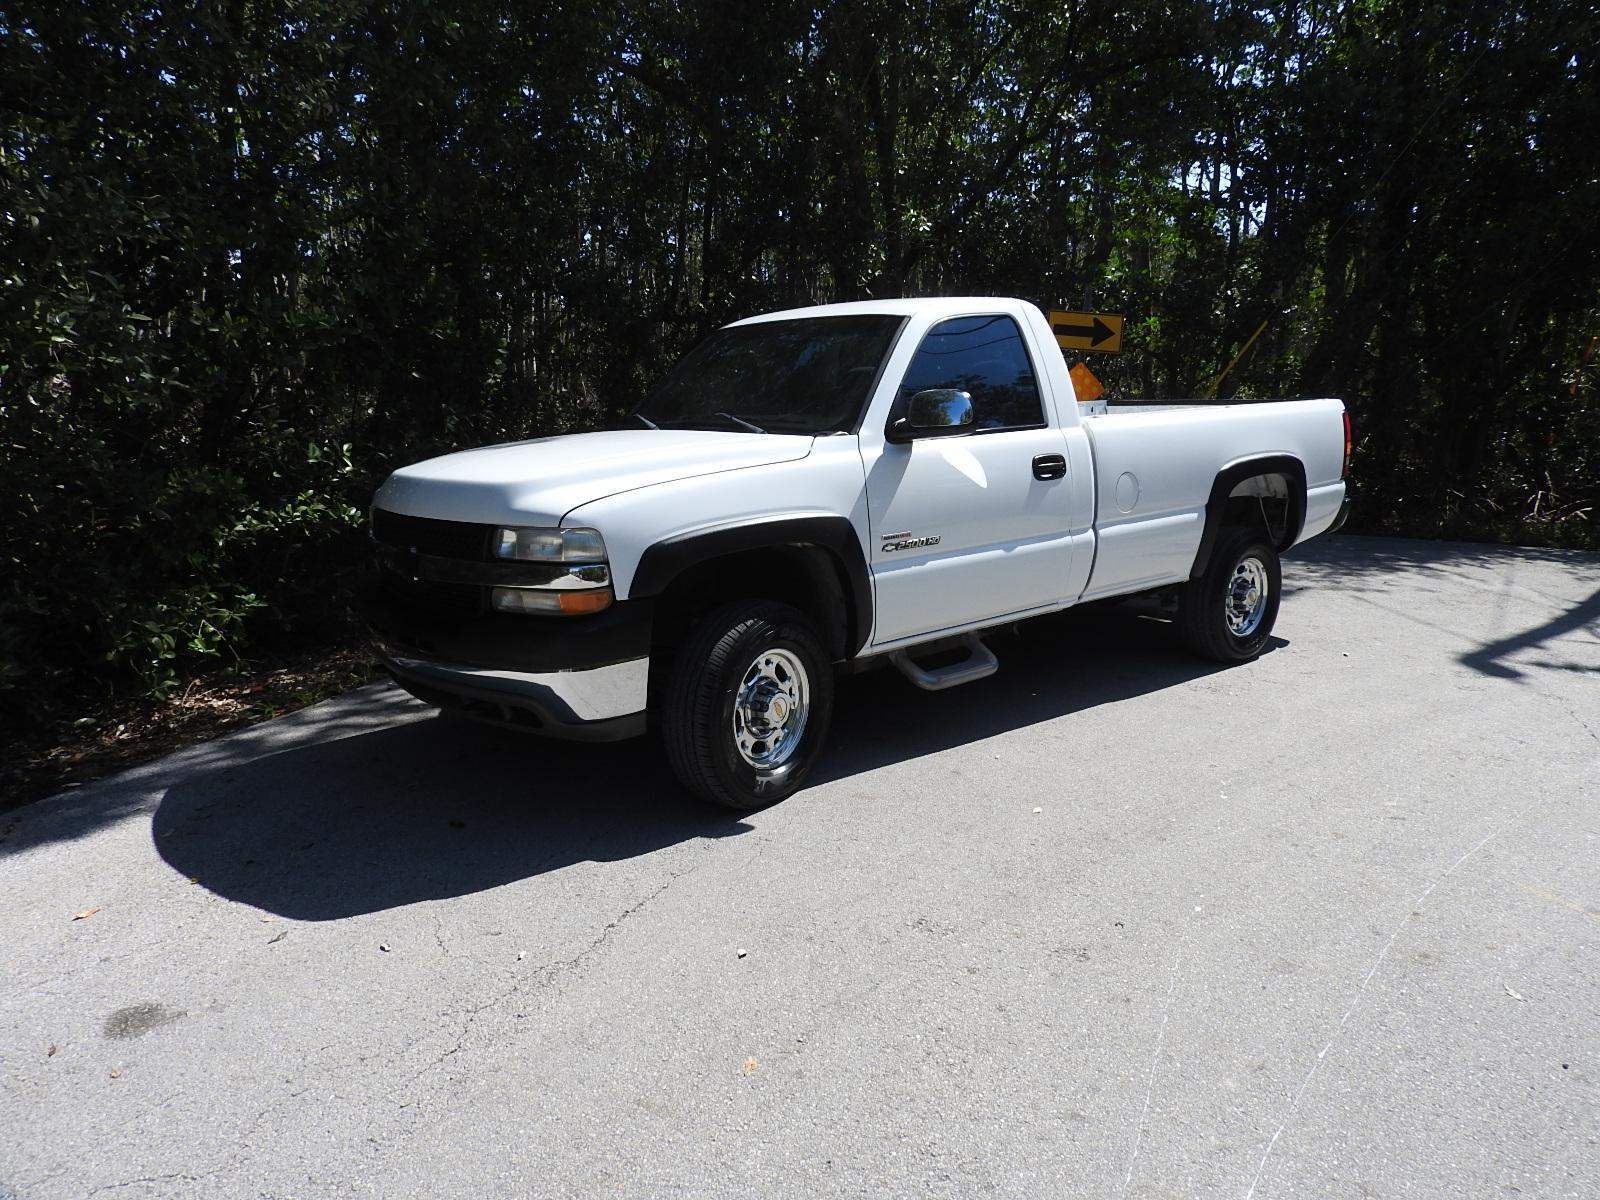 2002 Chevrolet 2500hd Duramax sel for sale in Key Largo FL